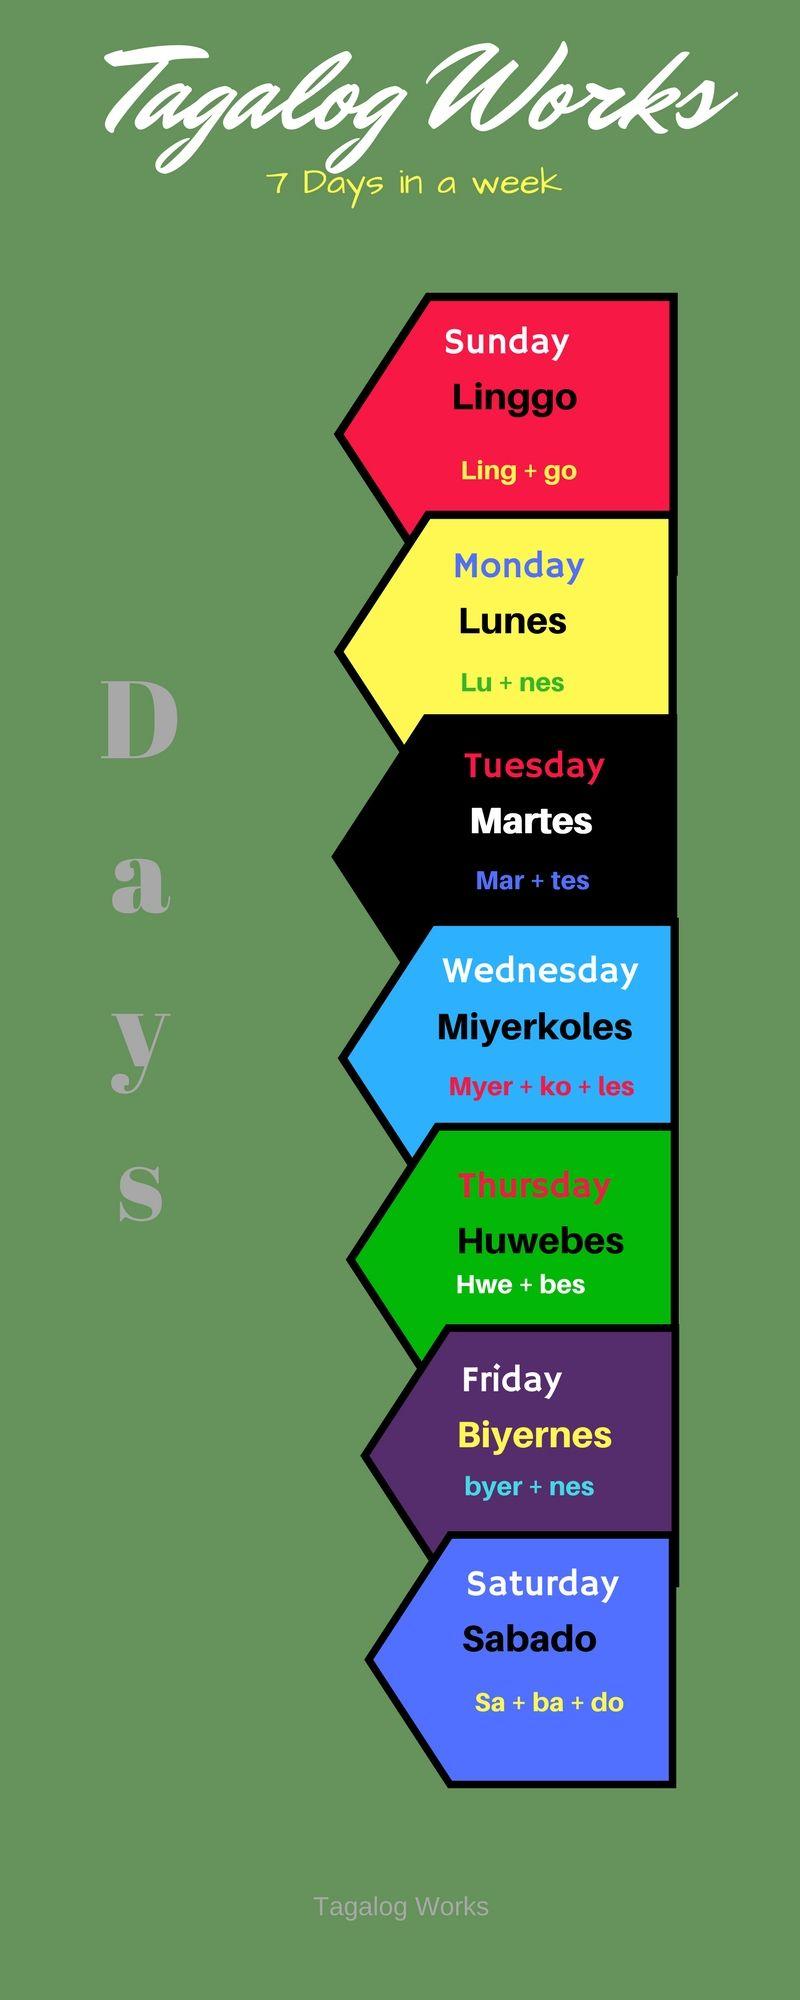 Days In A Week In Tagalog Filipino Words Tagalog Words Tagalog